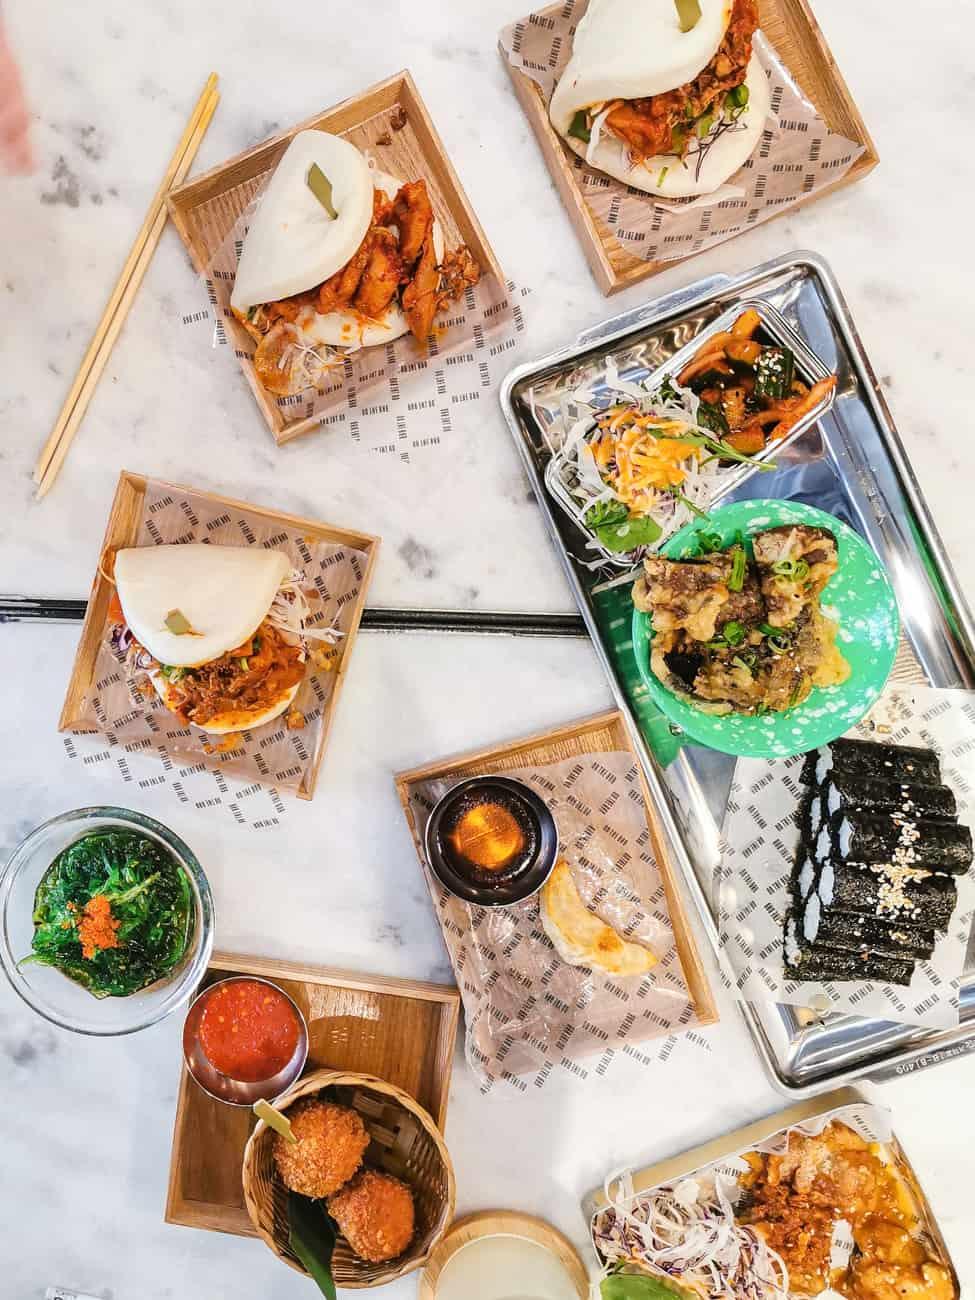 on-the-bab-paris-street-food-coreen-restaurant-13